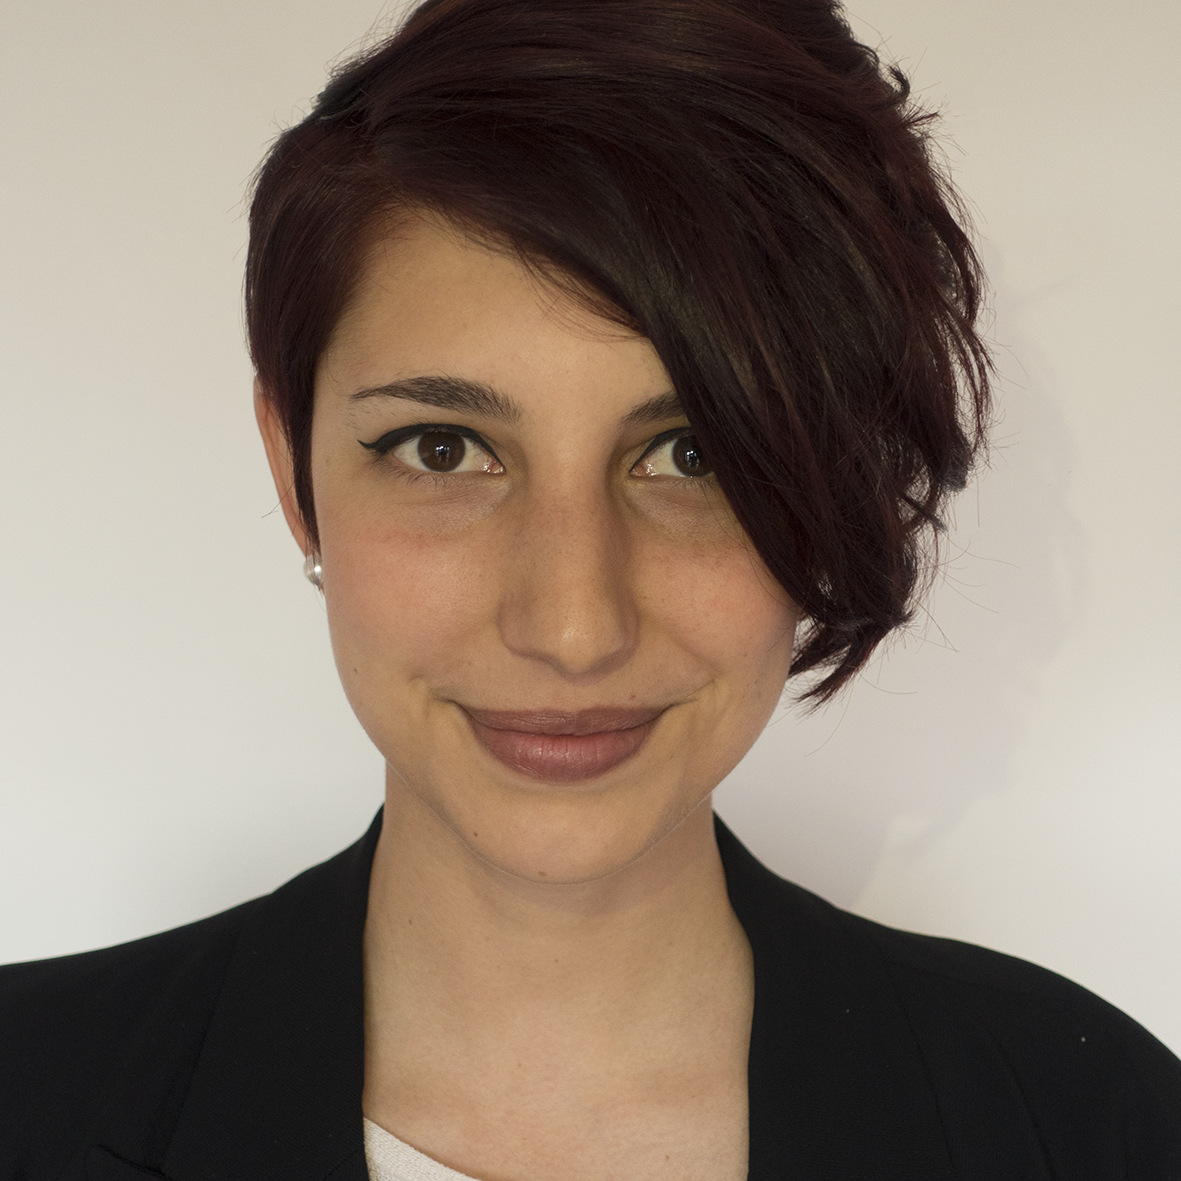 Chiara MANCO - ASSISTANT EDITOR, CASE STUDIES / WARC